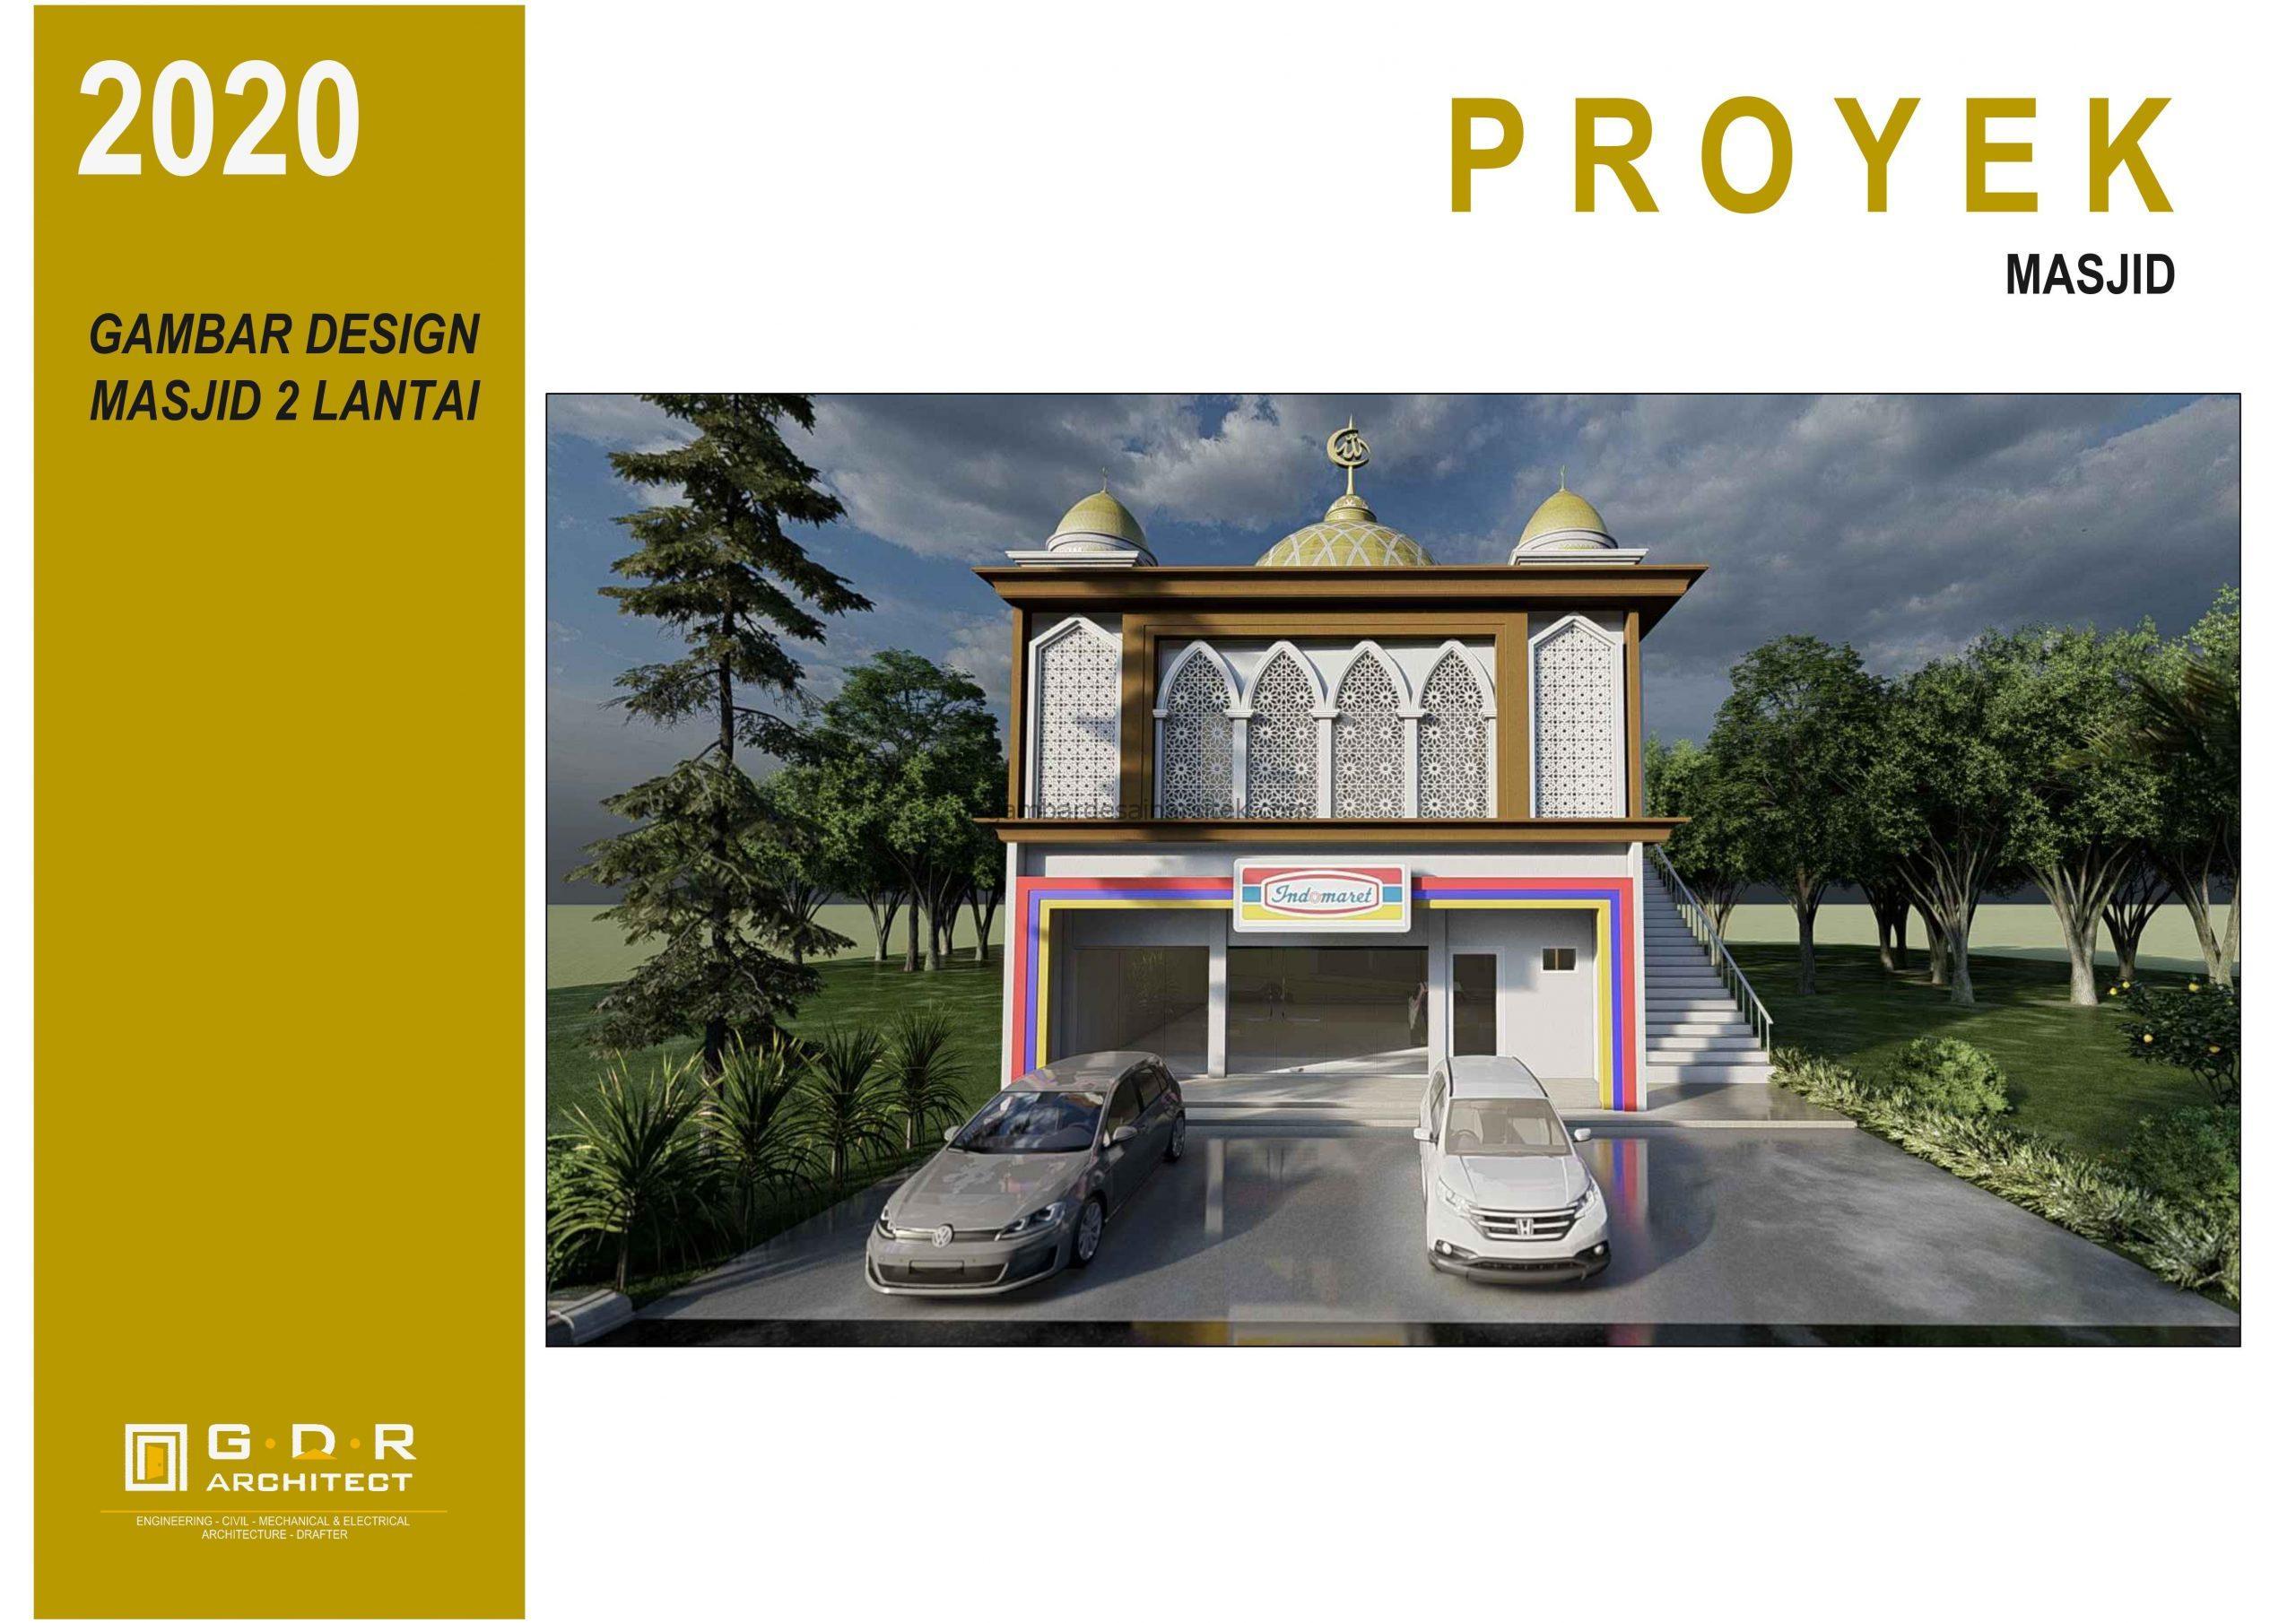 3D View Gambar Desain Masjid 2 Lantai ada Minimarket 1 scaled